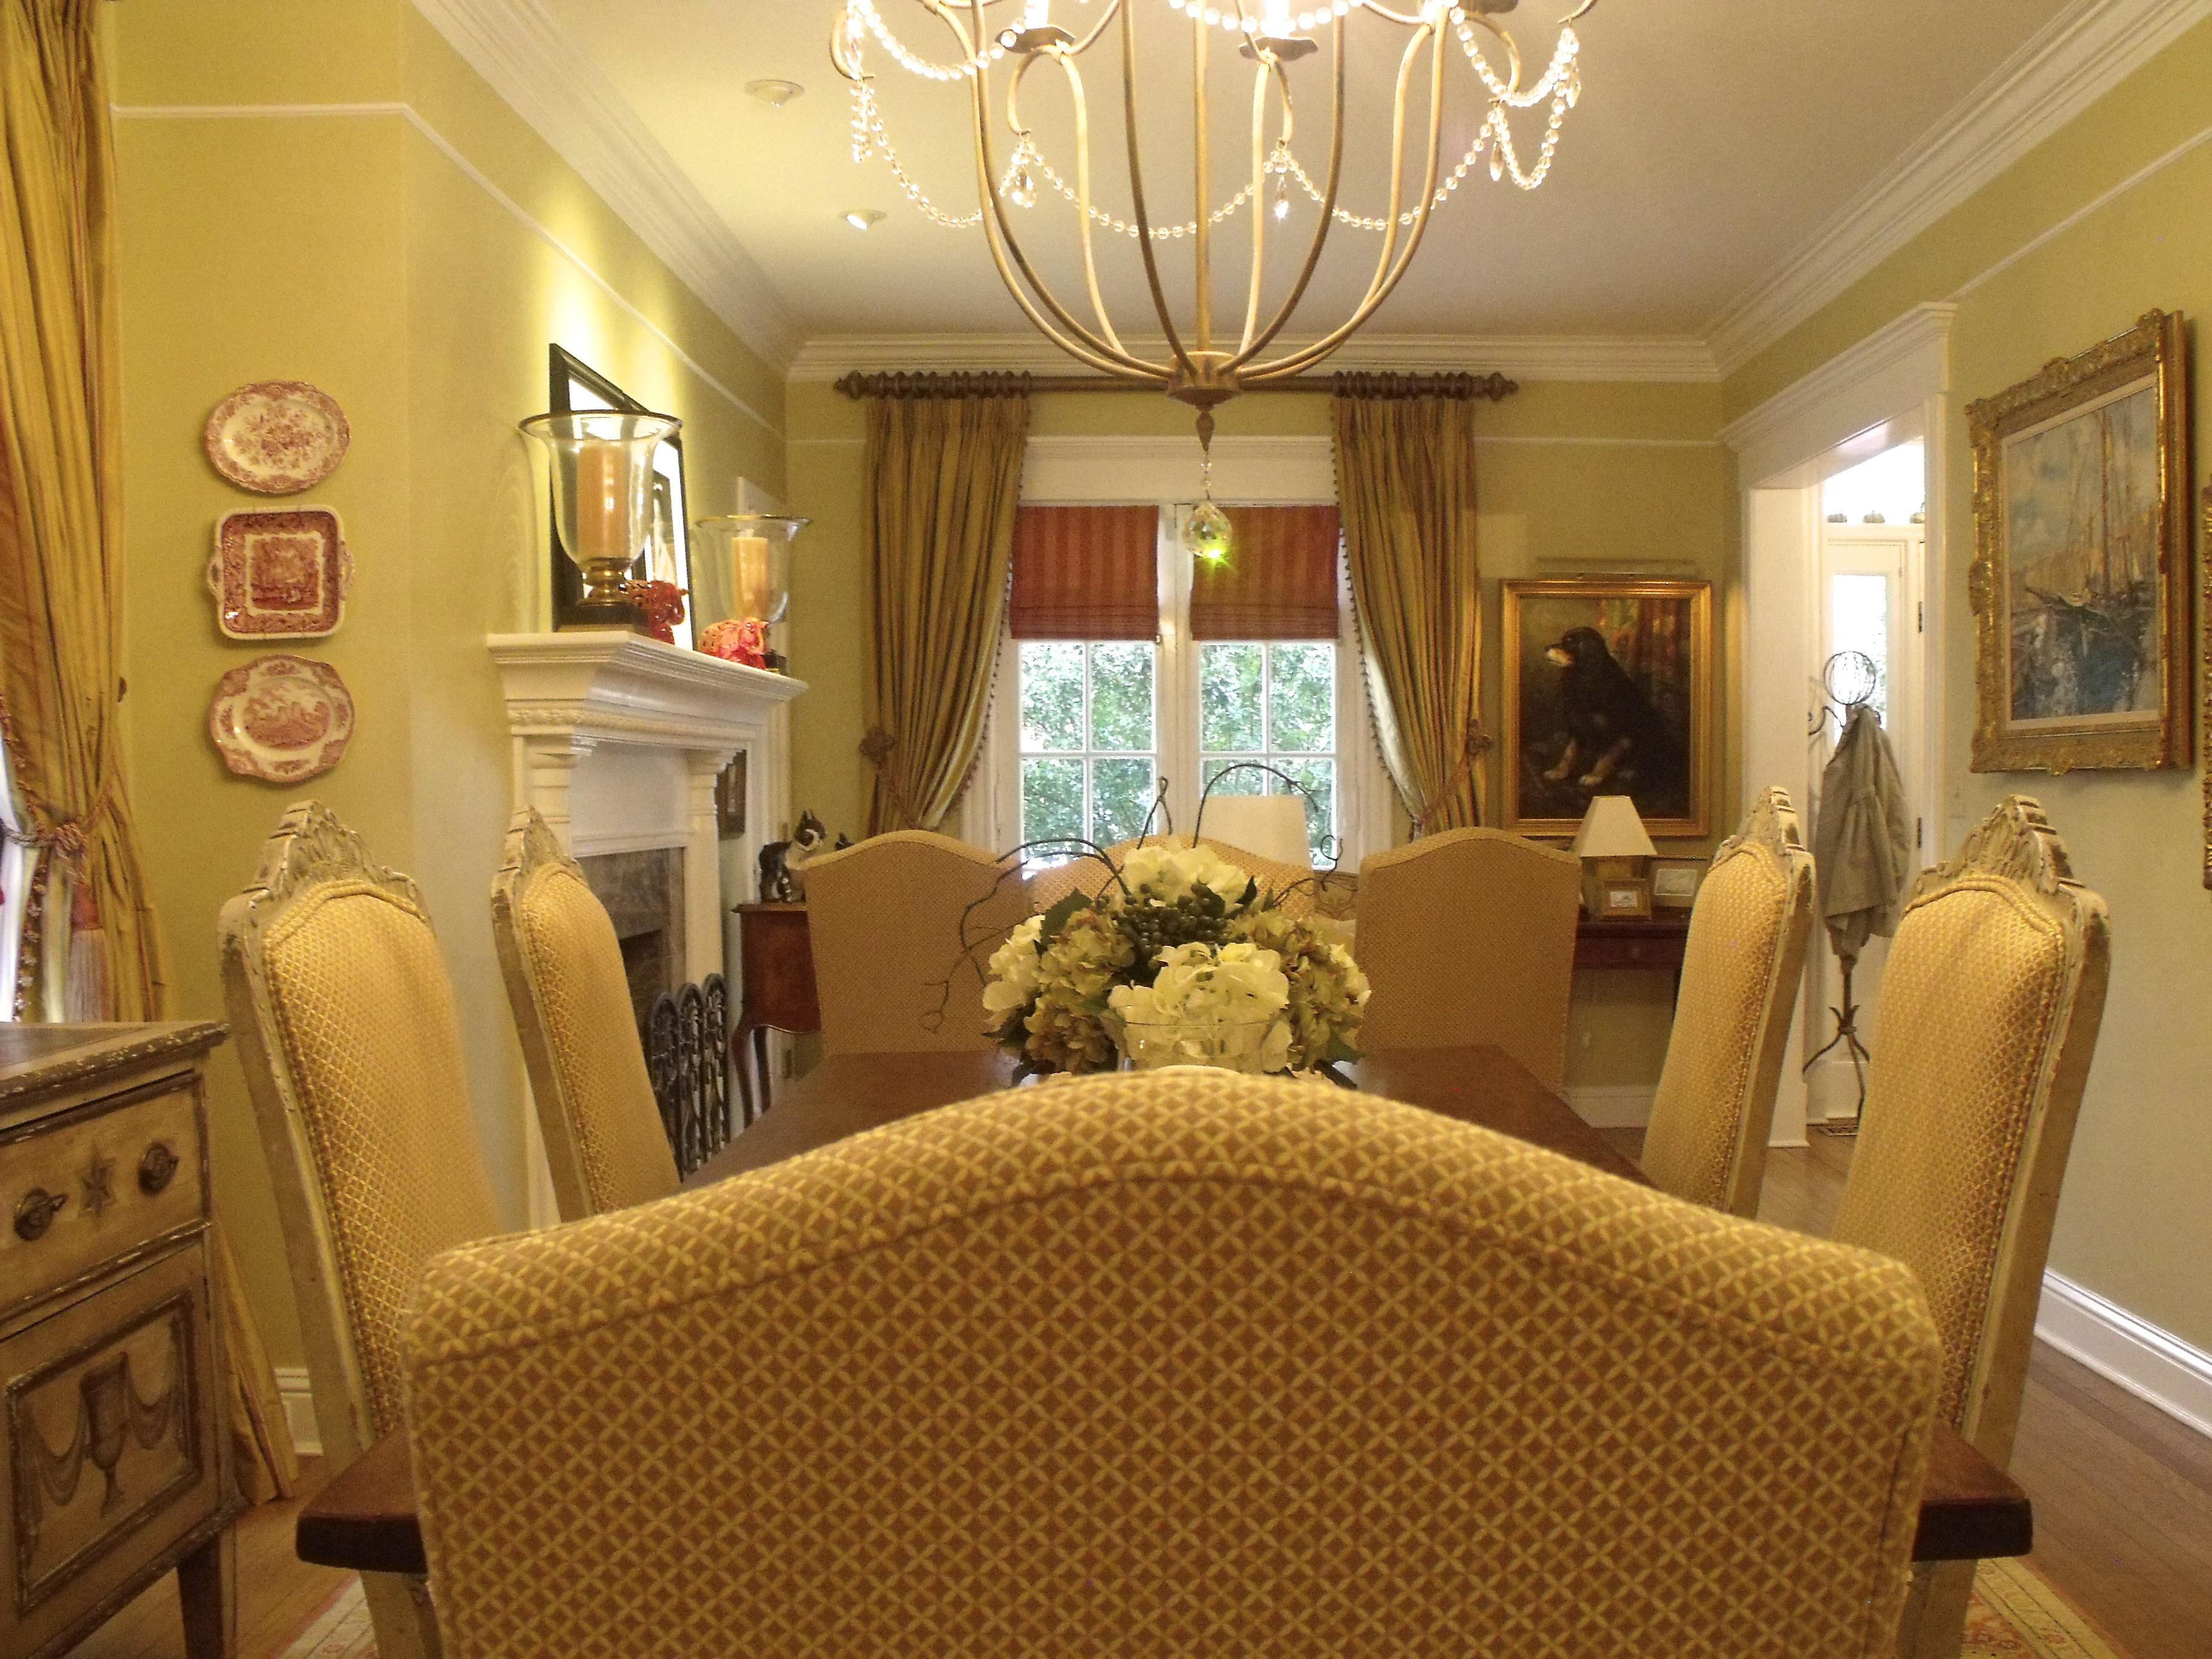 Best Interior Designer In Minneapolis Mn Roomscapes